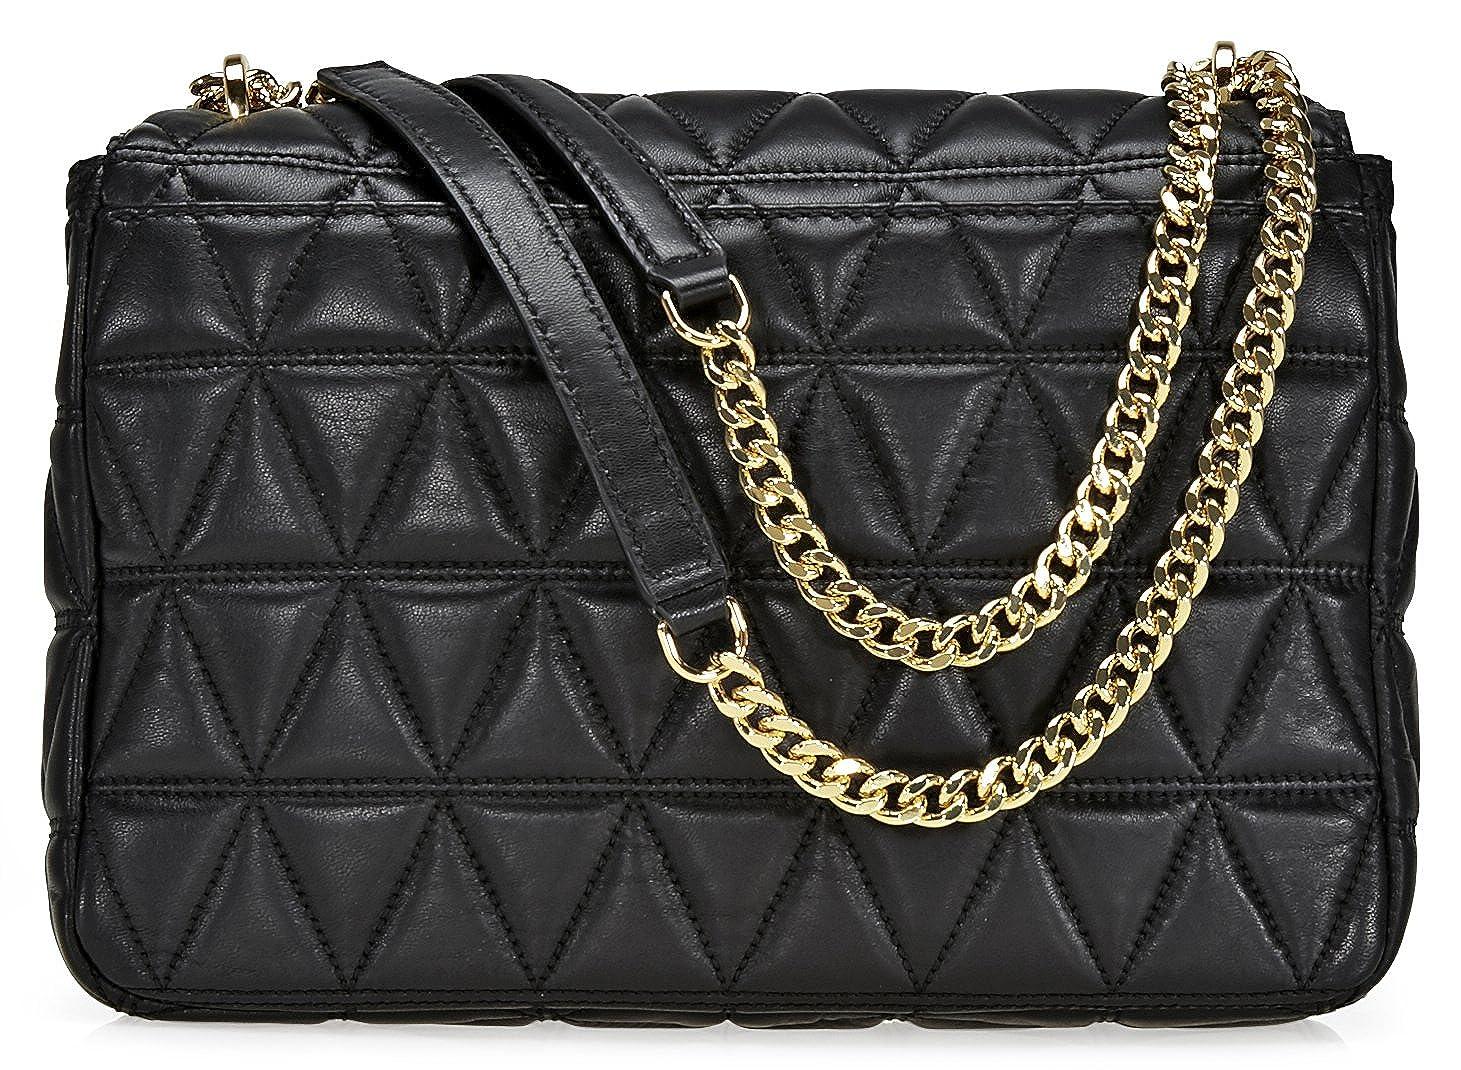 5167b89ee12f Michael Kors Sloan Extra Large Leather Quilted - Shoulder Bag - Black -  30S7GSLL4L-001  Amazon.de  Schuhe   Handtaschen